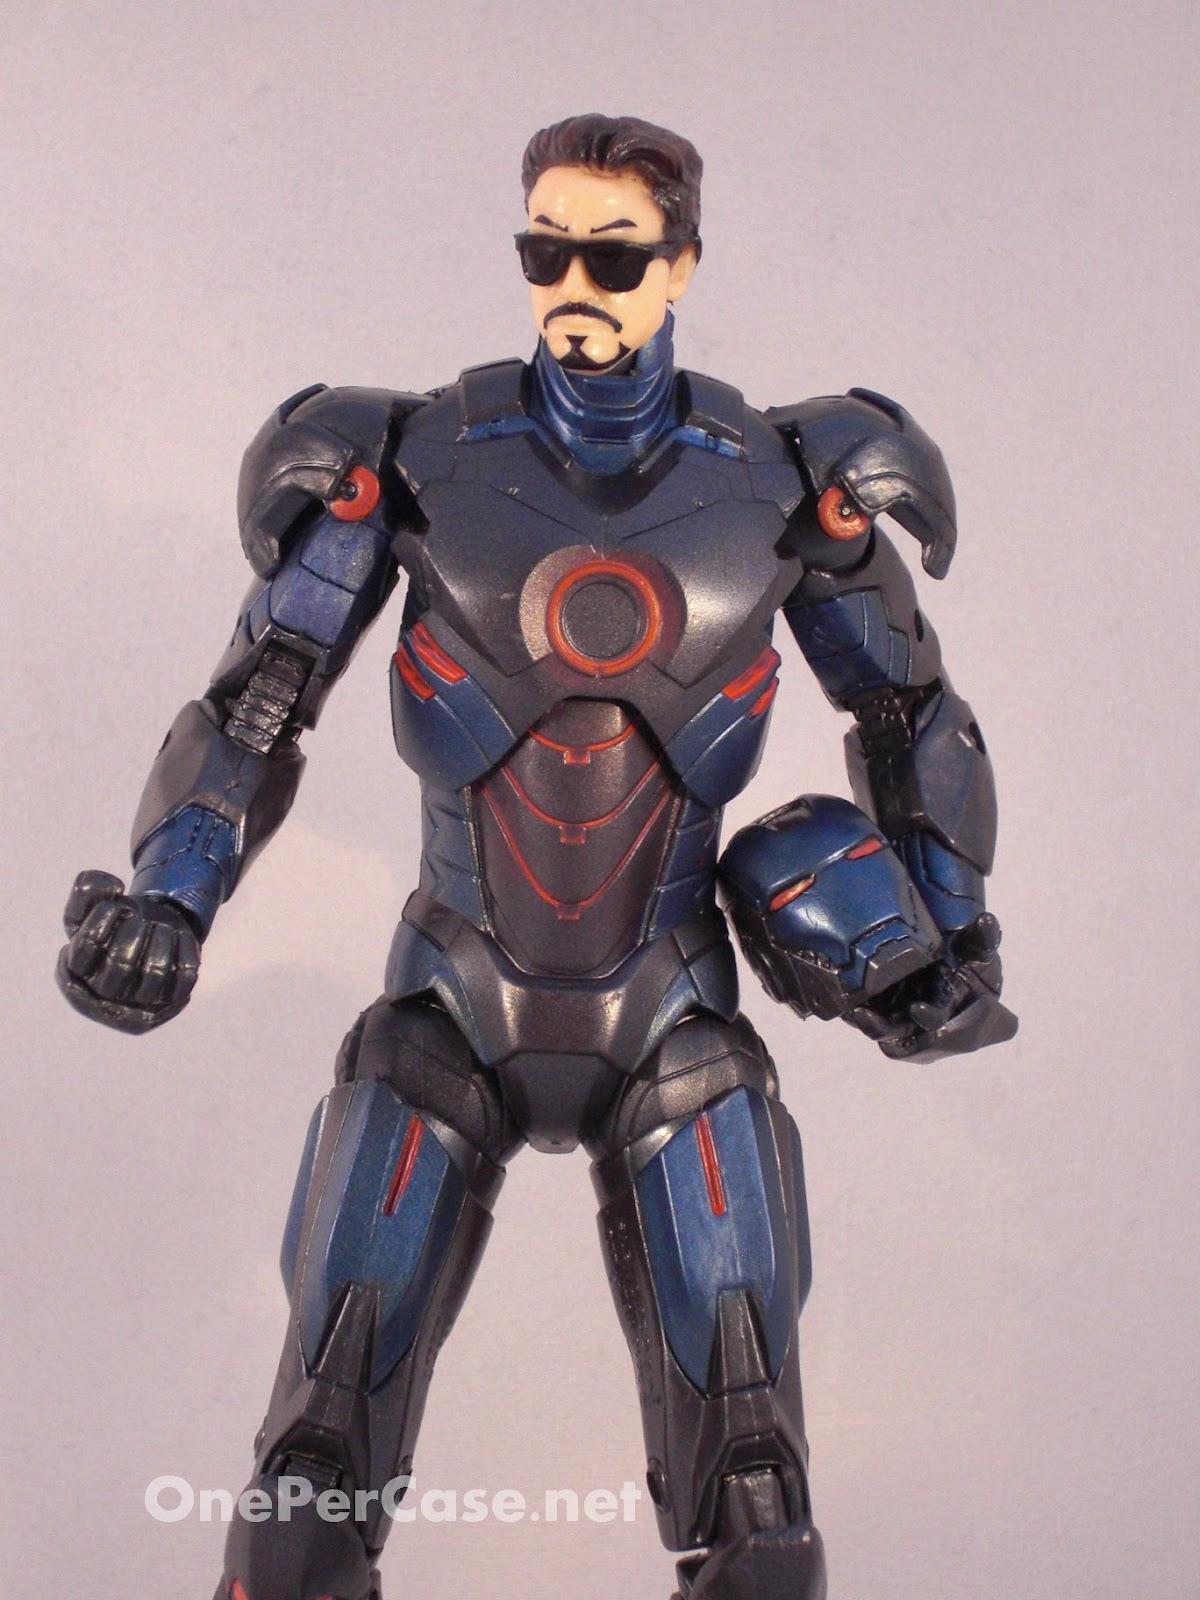 Iron Man 2 - Movie Poster 2 - Arc Reactor heart